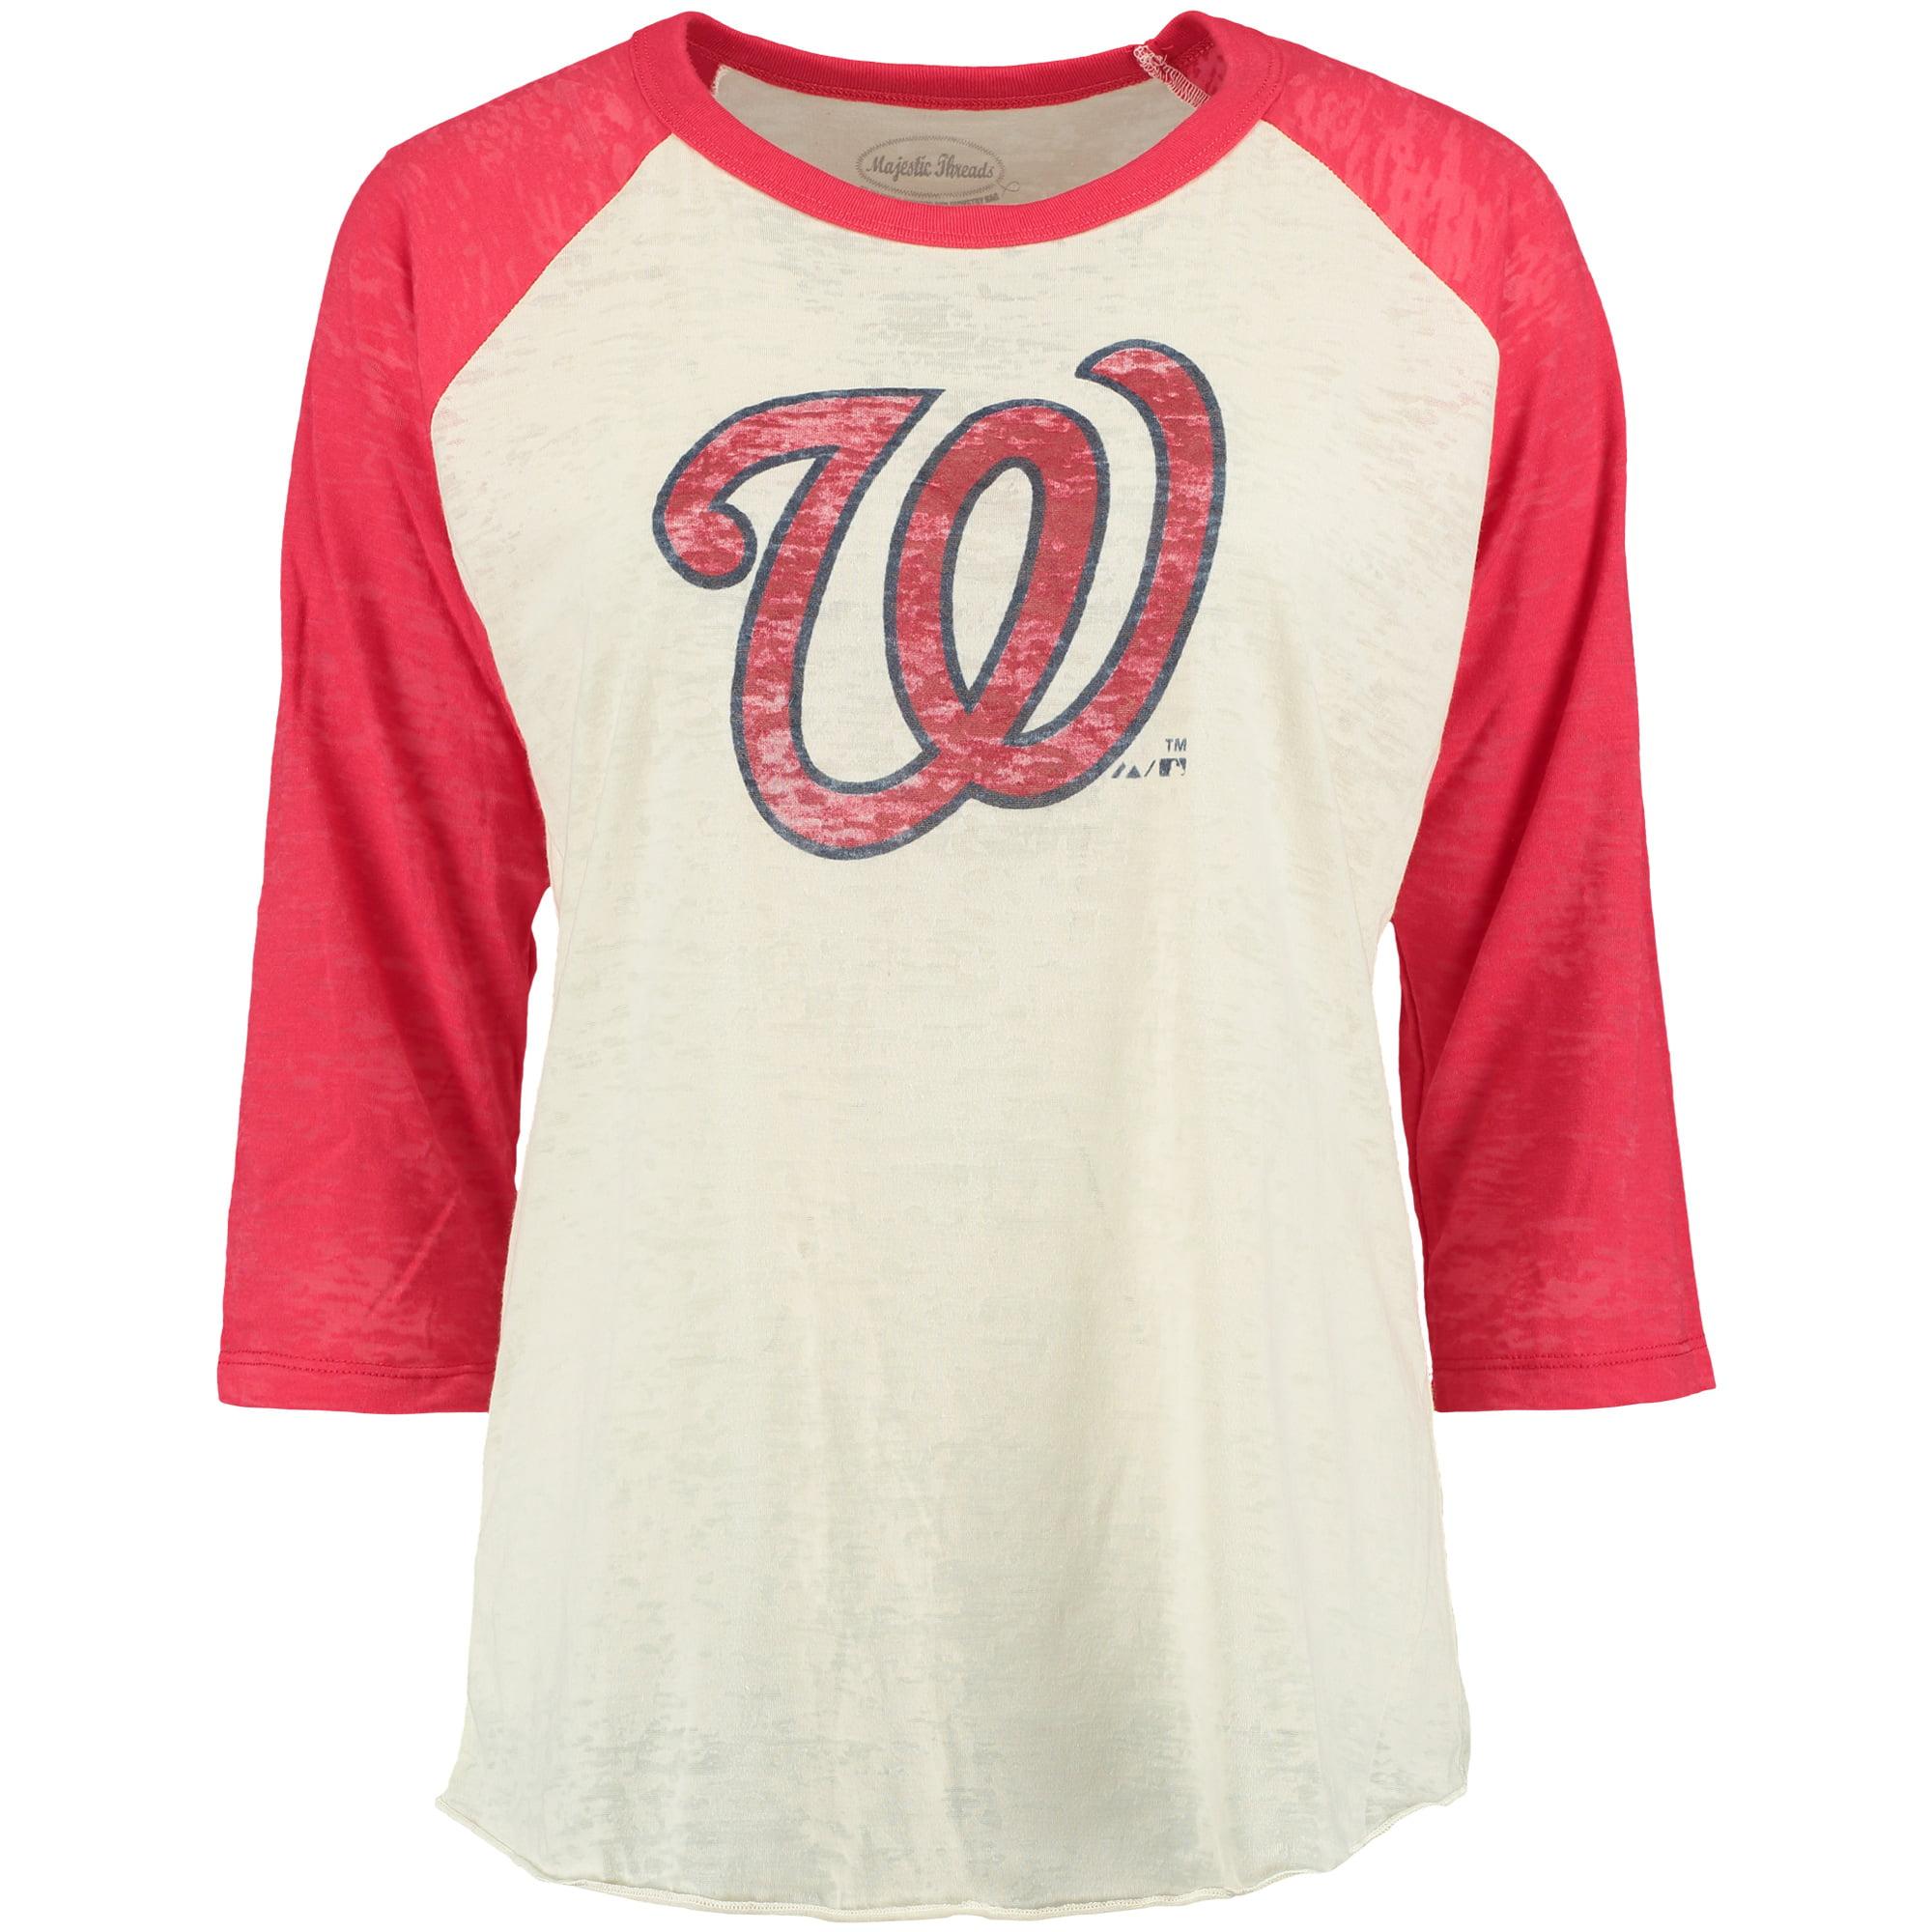 Washington Nationals Majestic Threads Women's Burnout Raglan Long Sleeve T-Shirt - Natural/Red